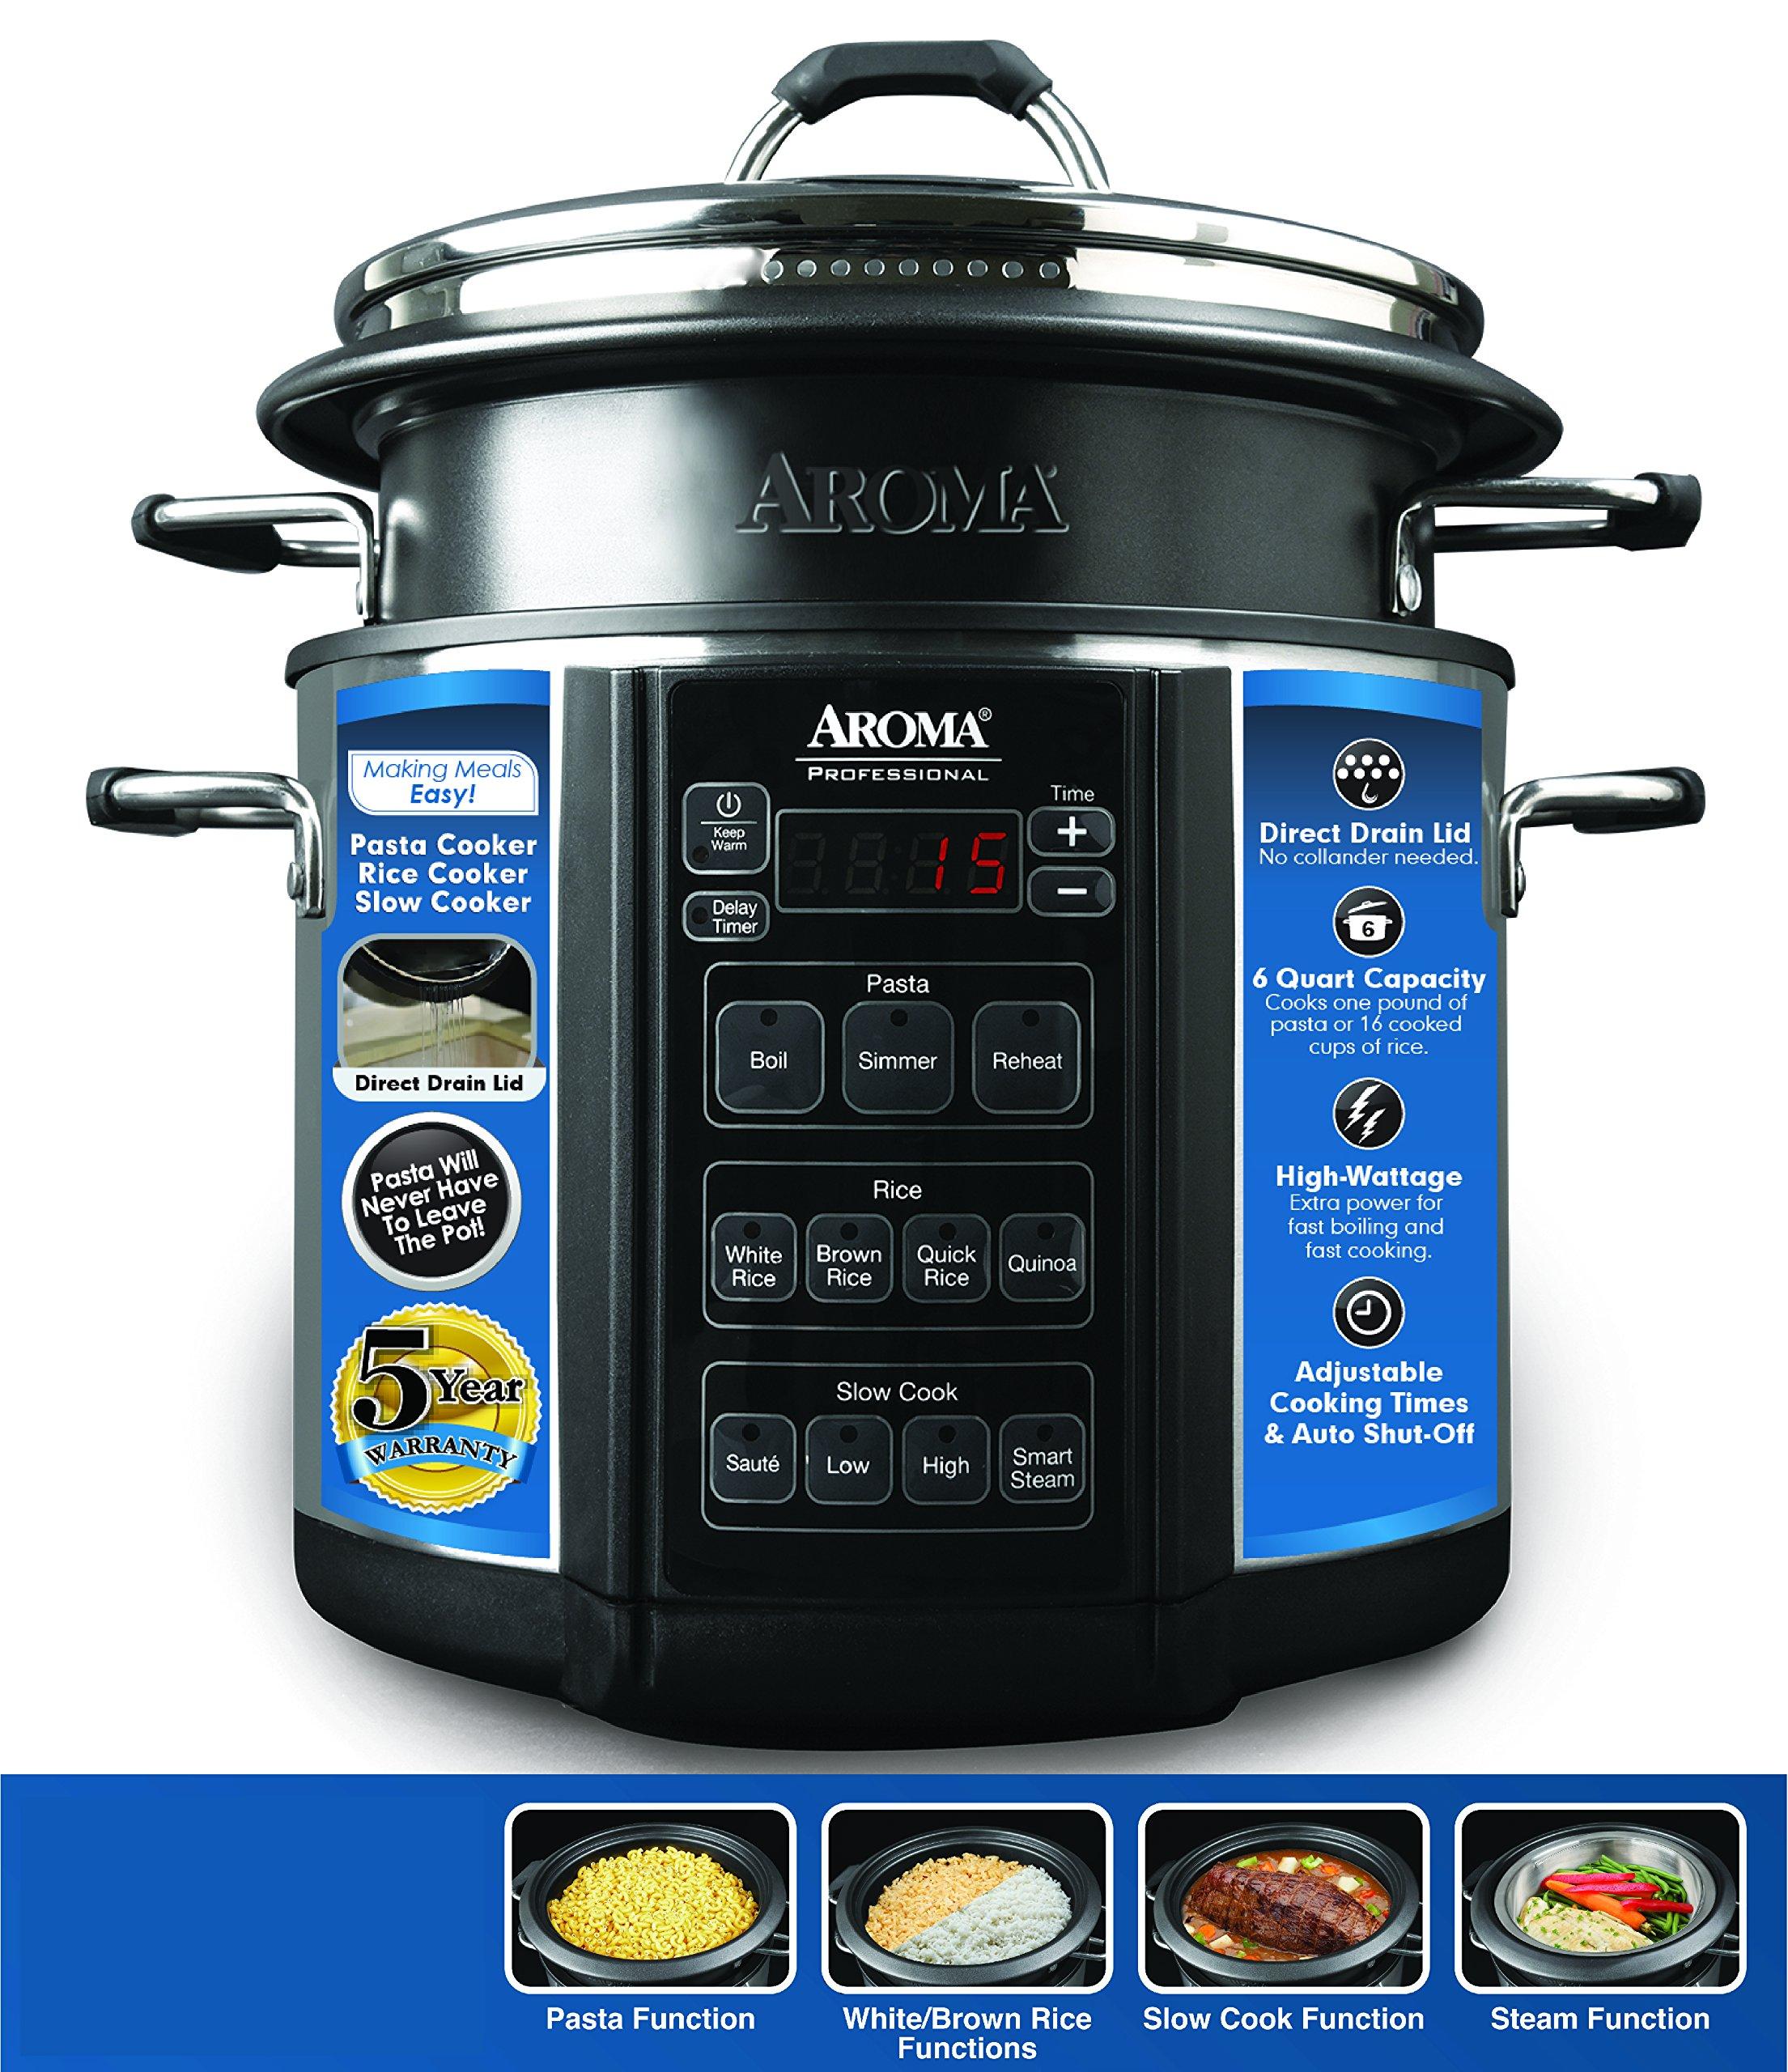 Aroma Professional Slow Cooker, 6 quart, Silver (AMC-300SG)